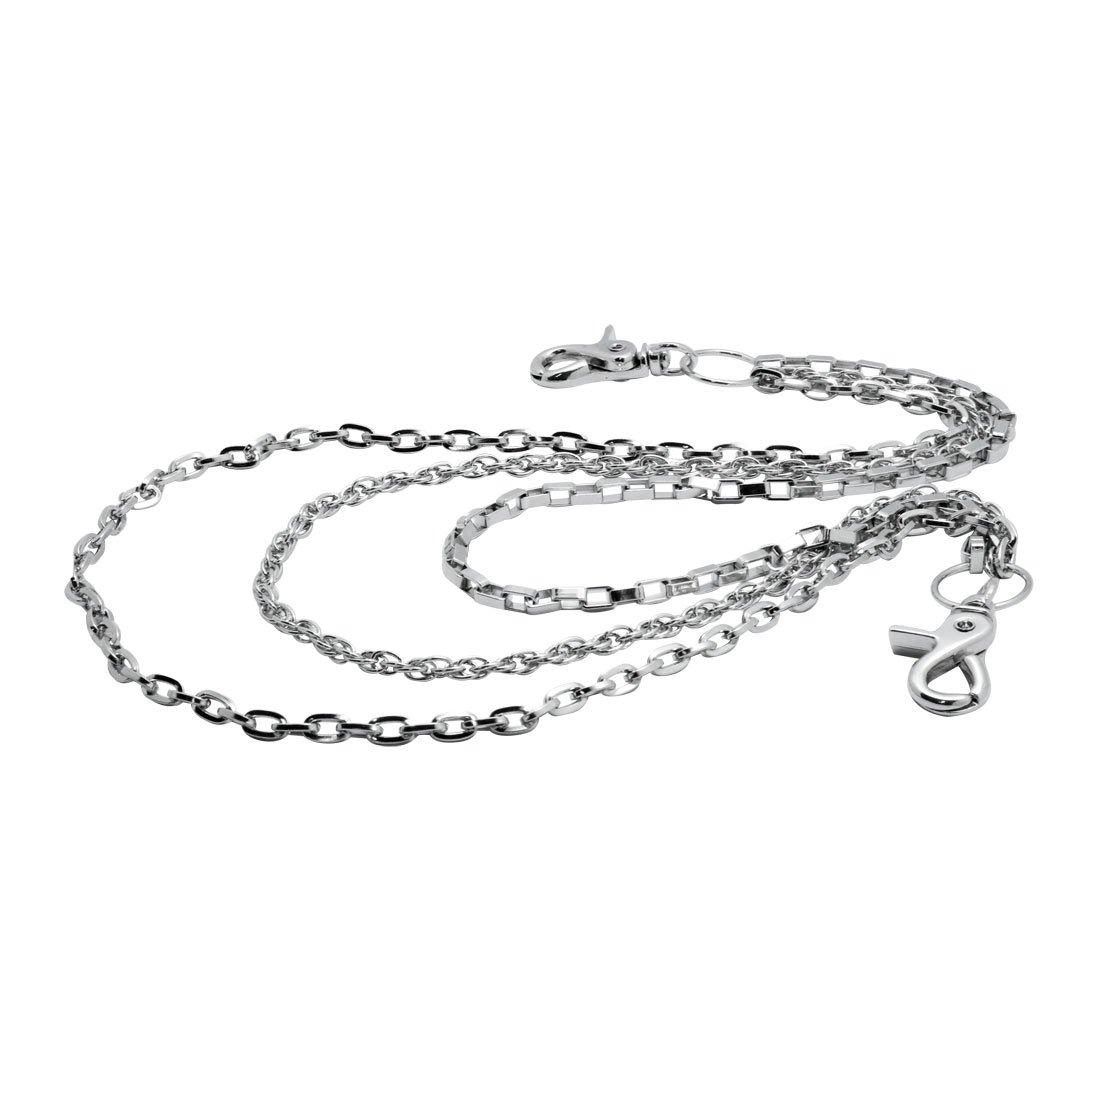 Uniqsum Simple Slim Triple wallet chain Swivel Trigger snap Lightweight Biker Punk Key chain (Silver)